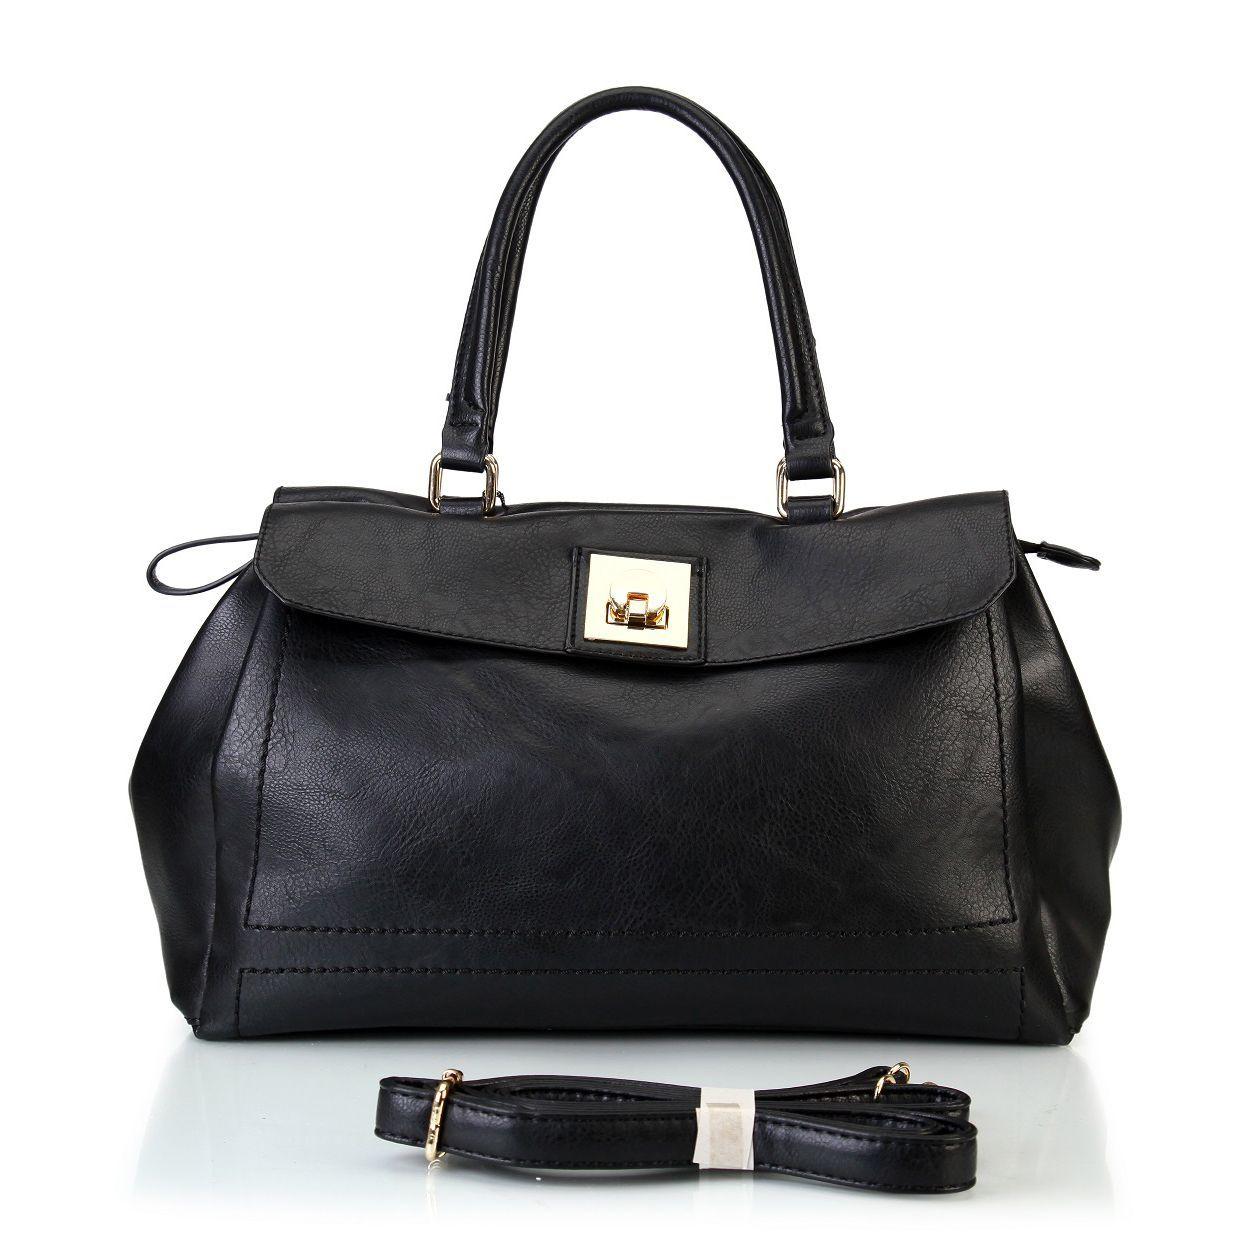 Diophy Top Handles Roomy Tote Bag, Women's